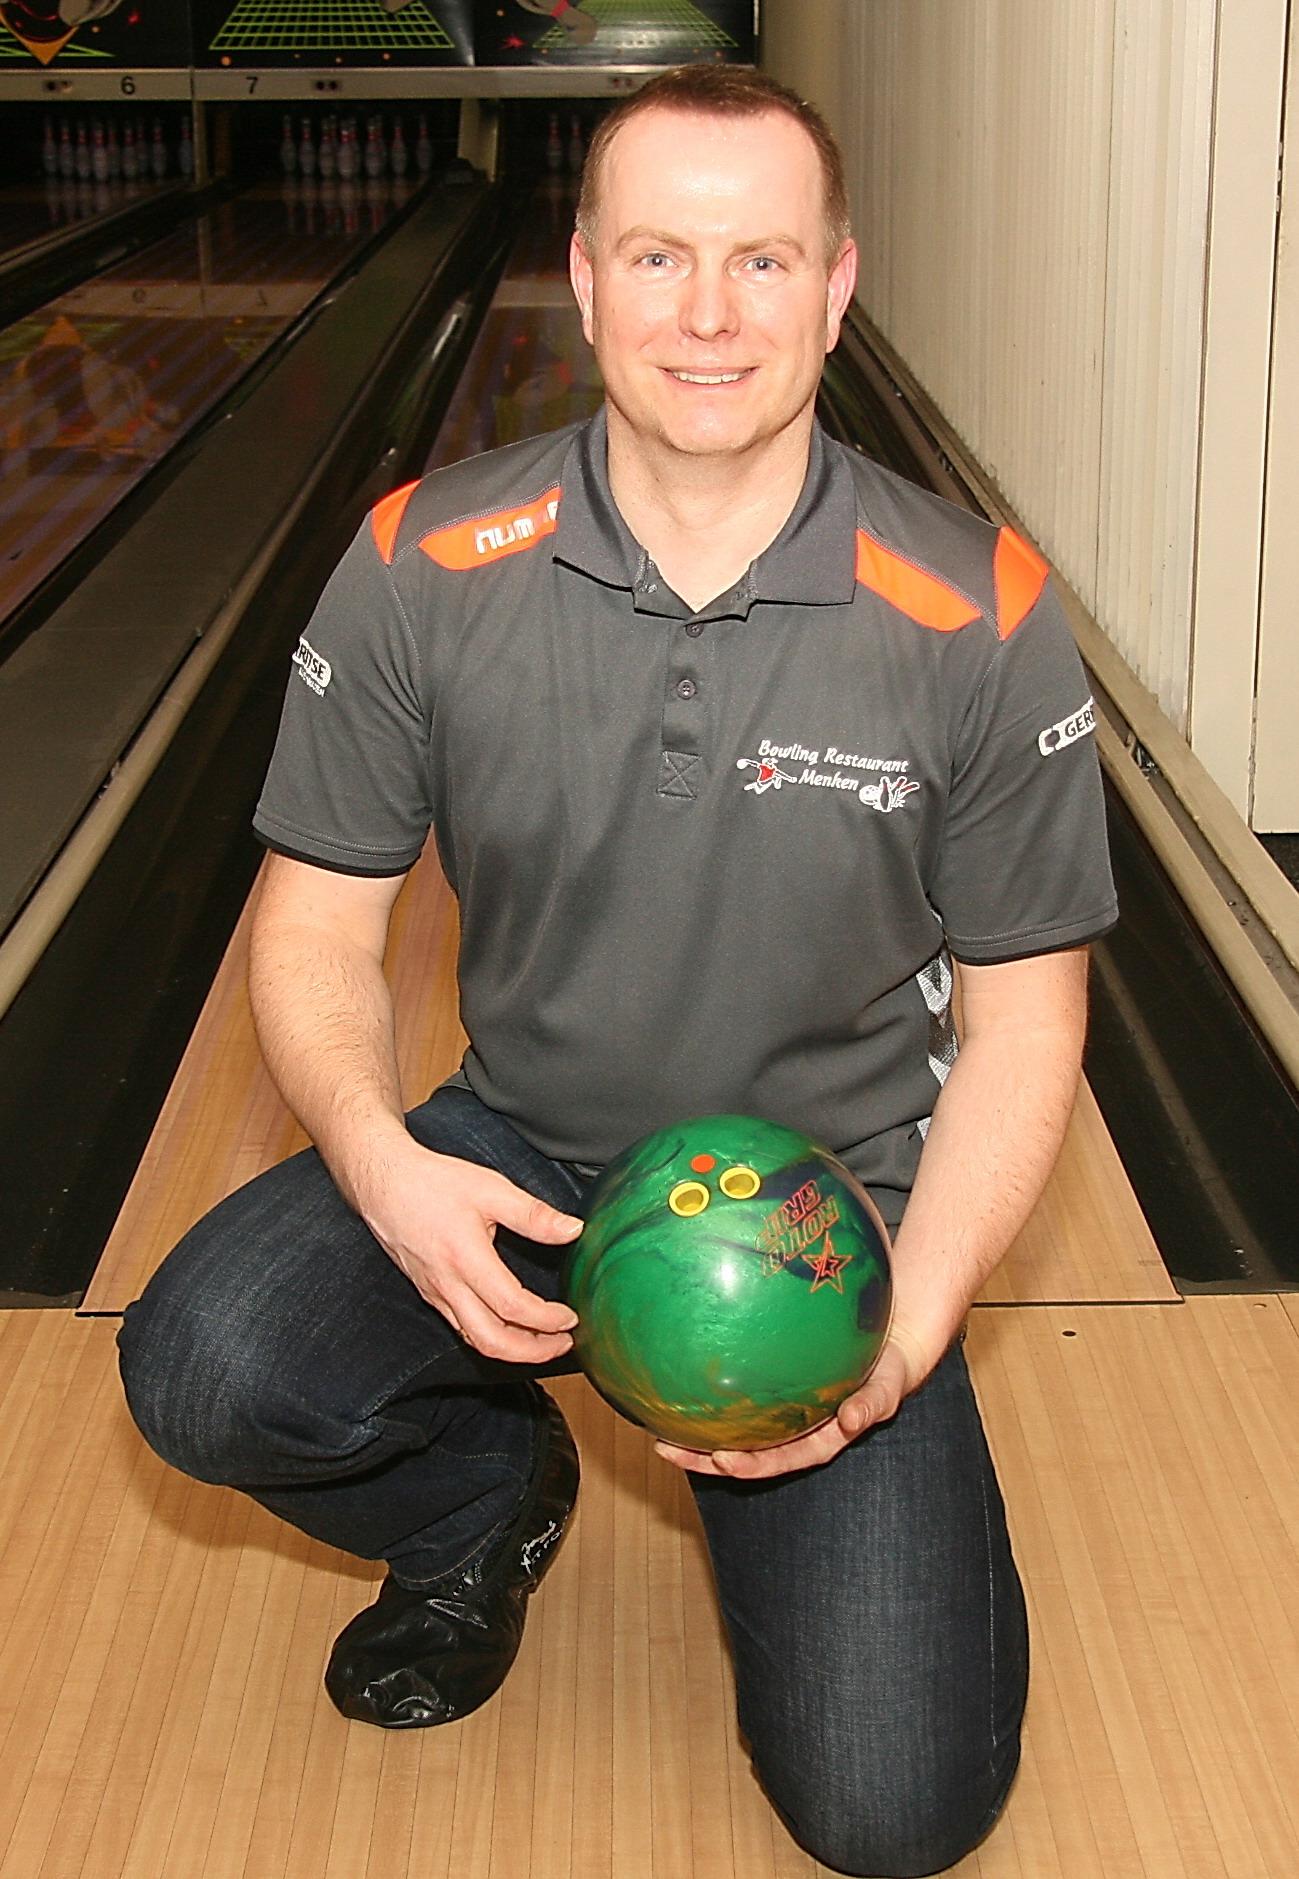 http://www.bowlingverenigingheiloo.nl/wall_of_fame/foto's/2014_0213-300Game-FrankvanStroe.jpg